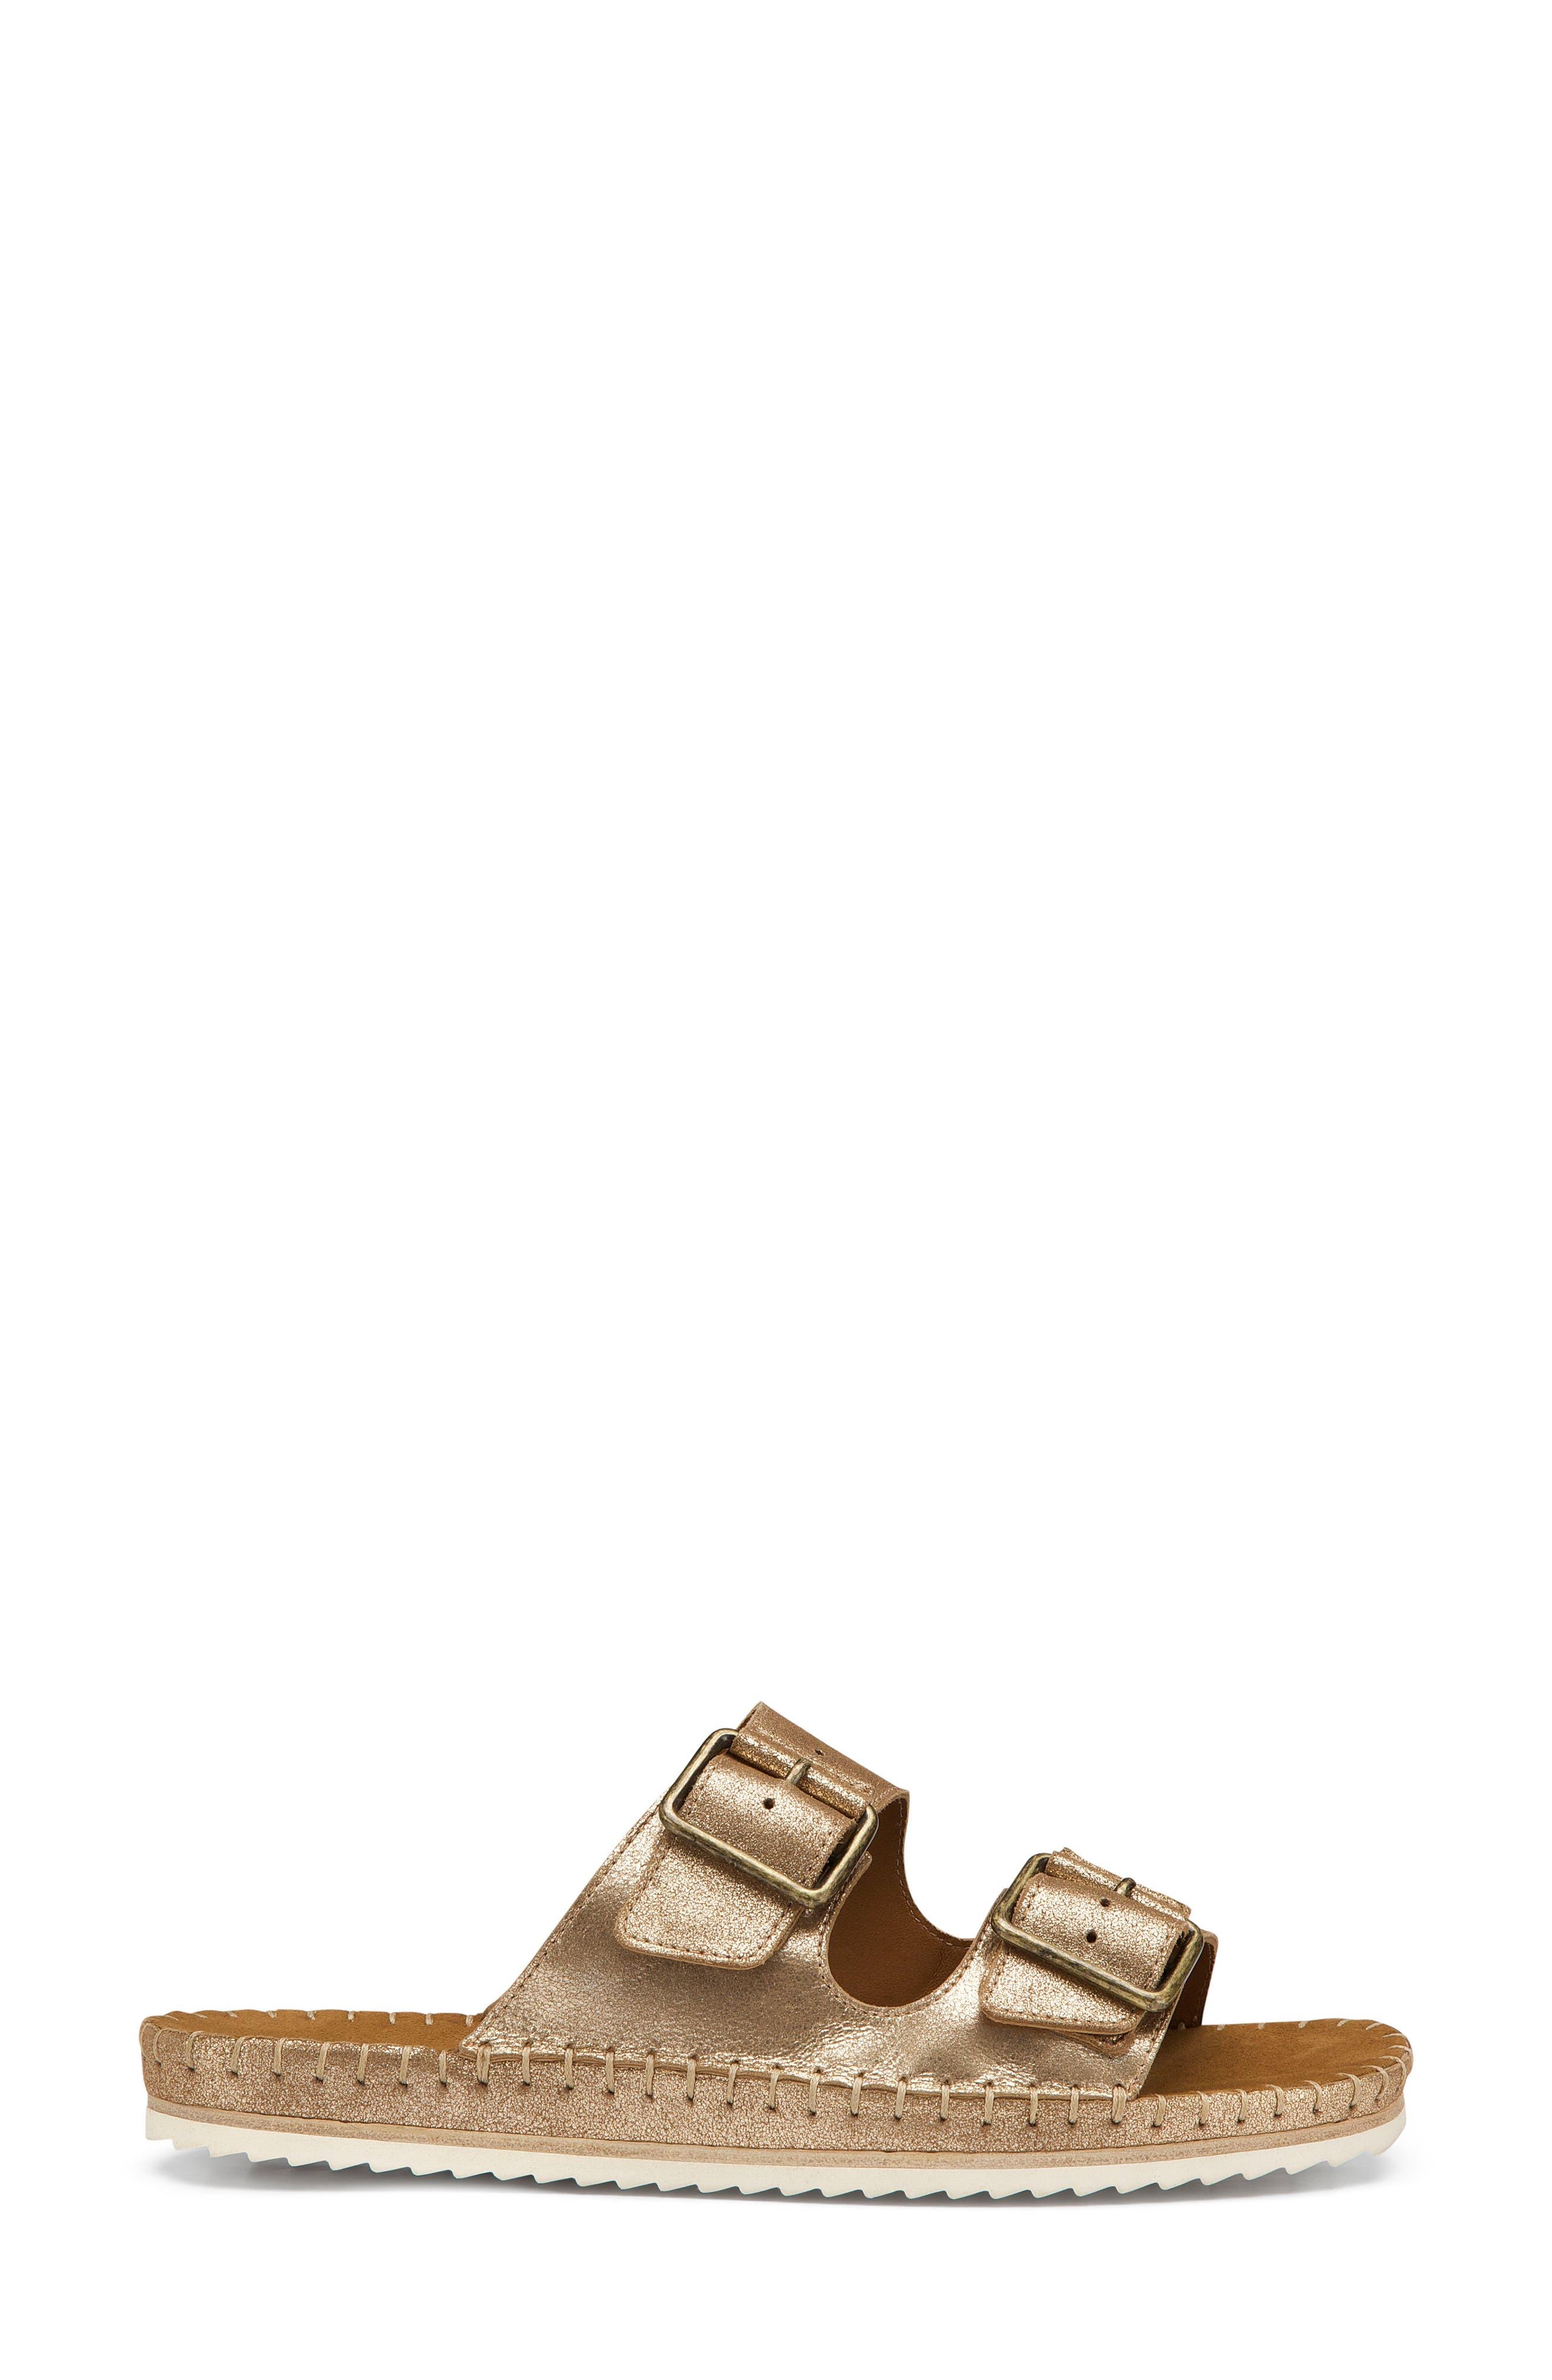 Carli Slide Sandal,                             Alternate thumbnail 3, color,                             Gold Metallic Suede